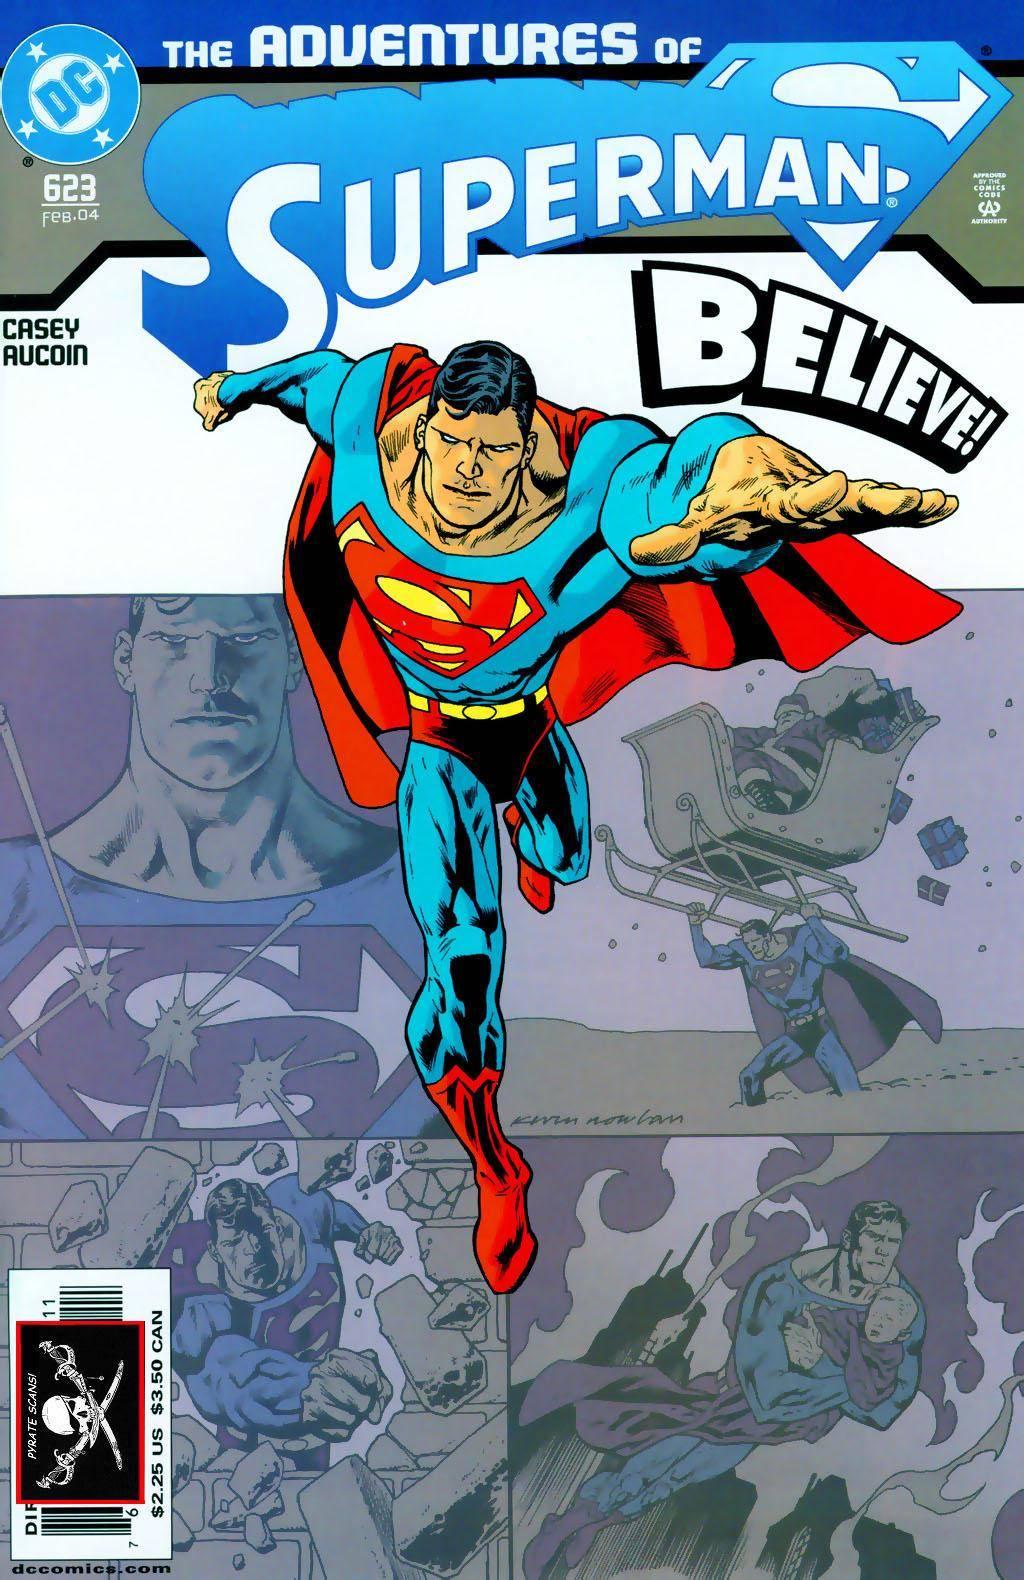 Adventures of Superman 623